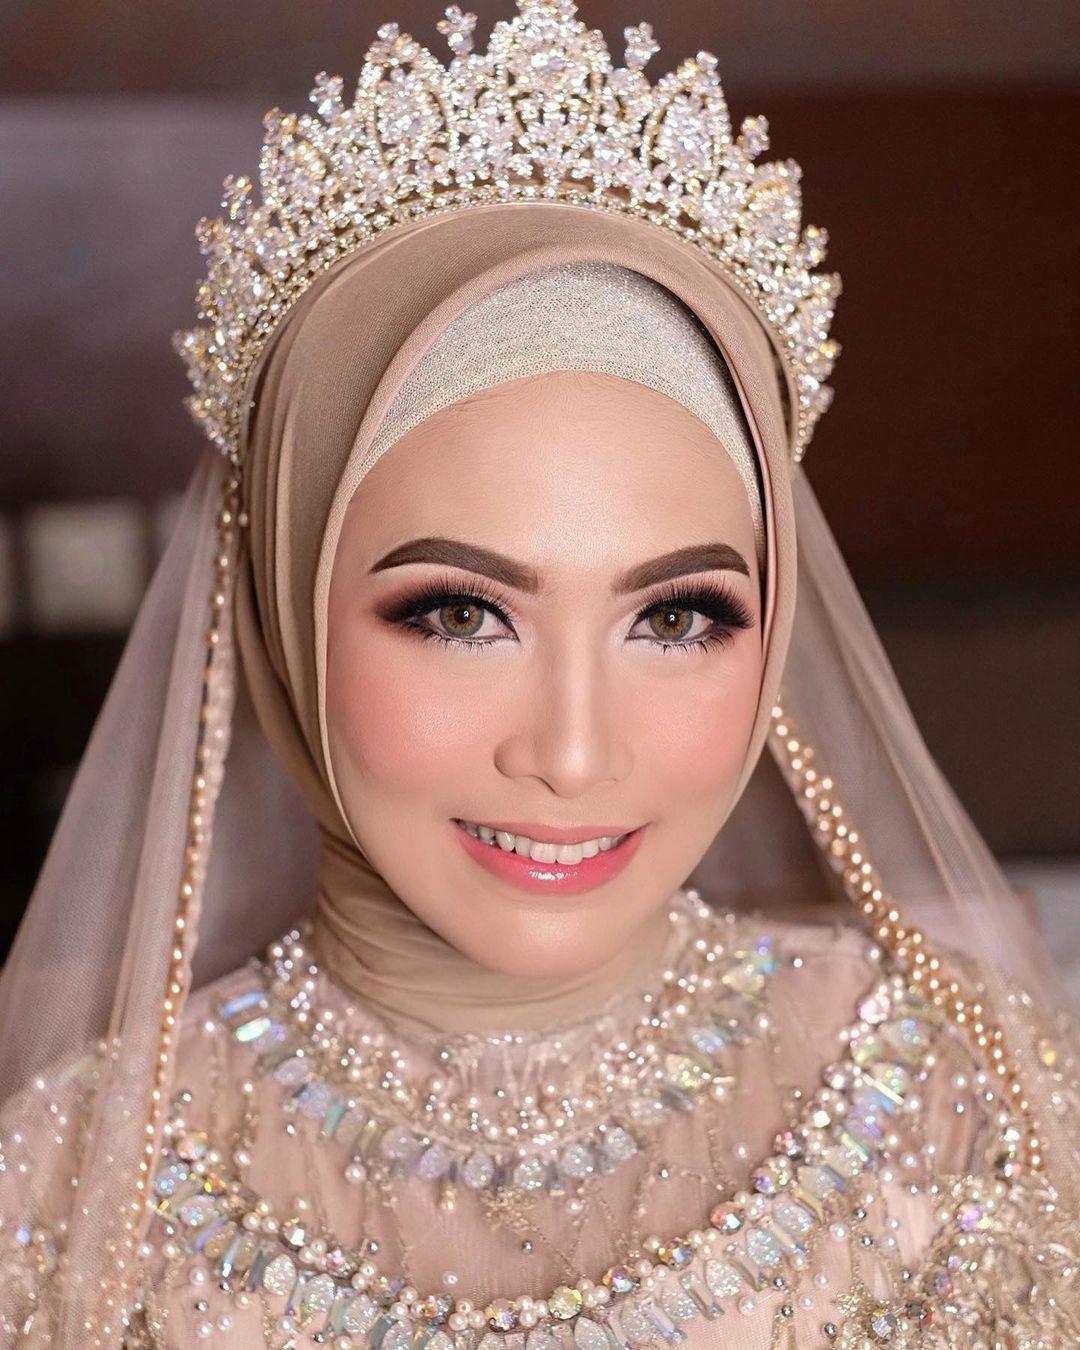 Inspirasi Maekup Modern Untuk Yang Berhijab Rias Wajah Pengantin Kerudung Pengantin Makeup Pengantin